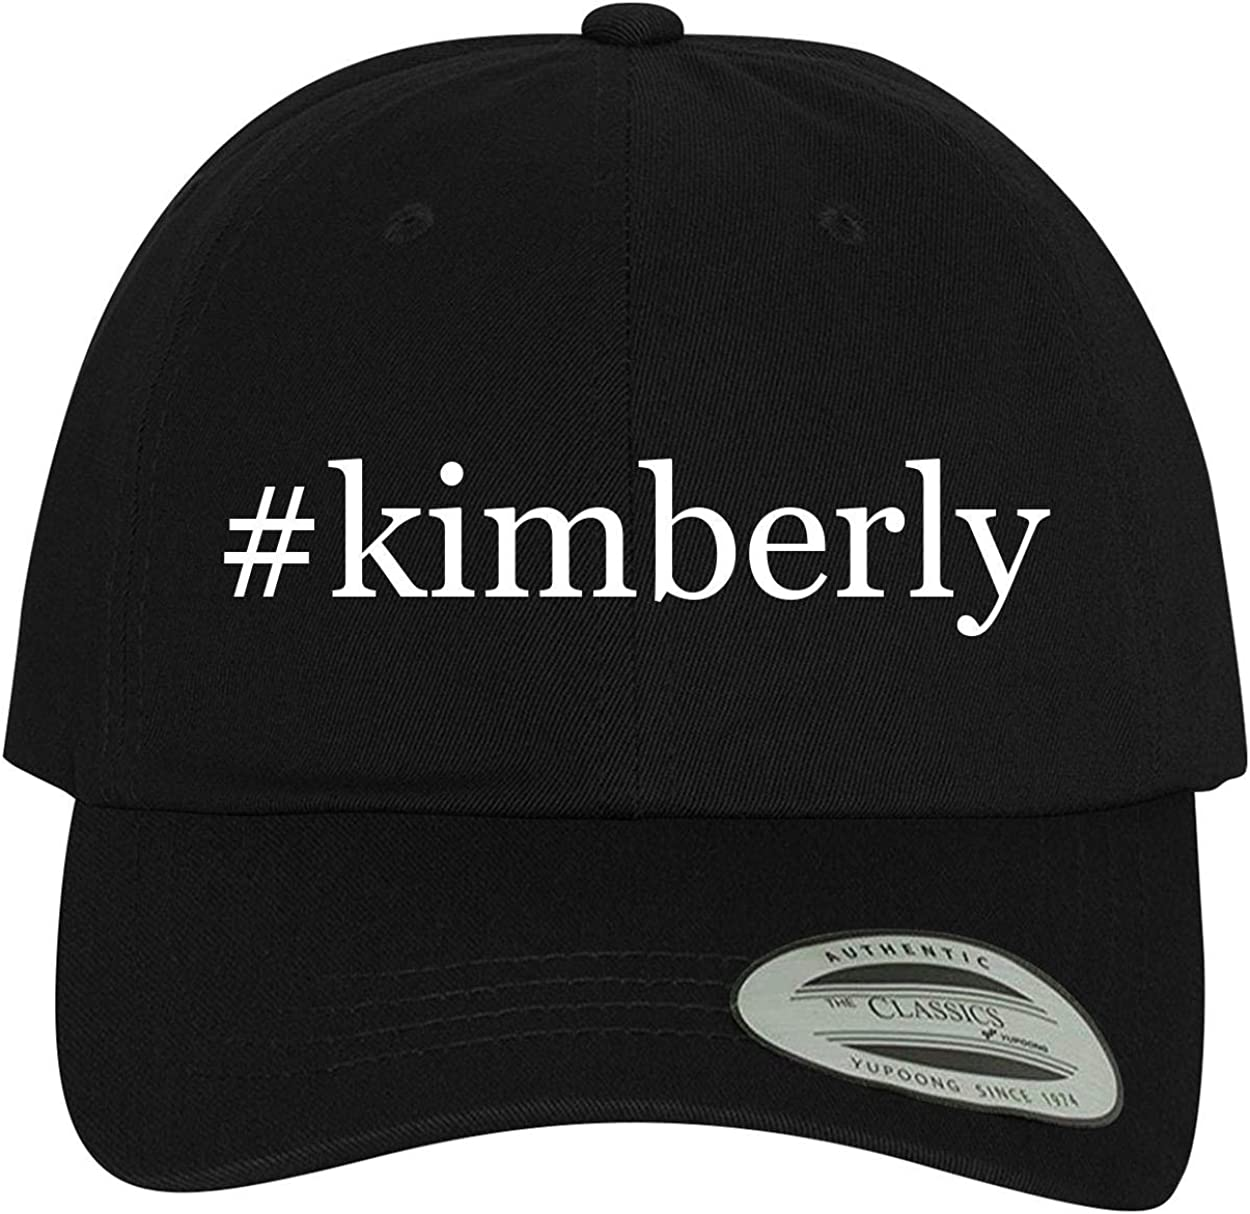 Comfortable Dad Hat Baseball Cap BH Cool Designs #Kimberly